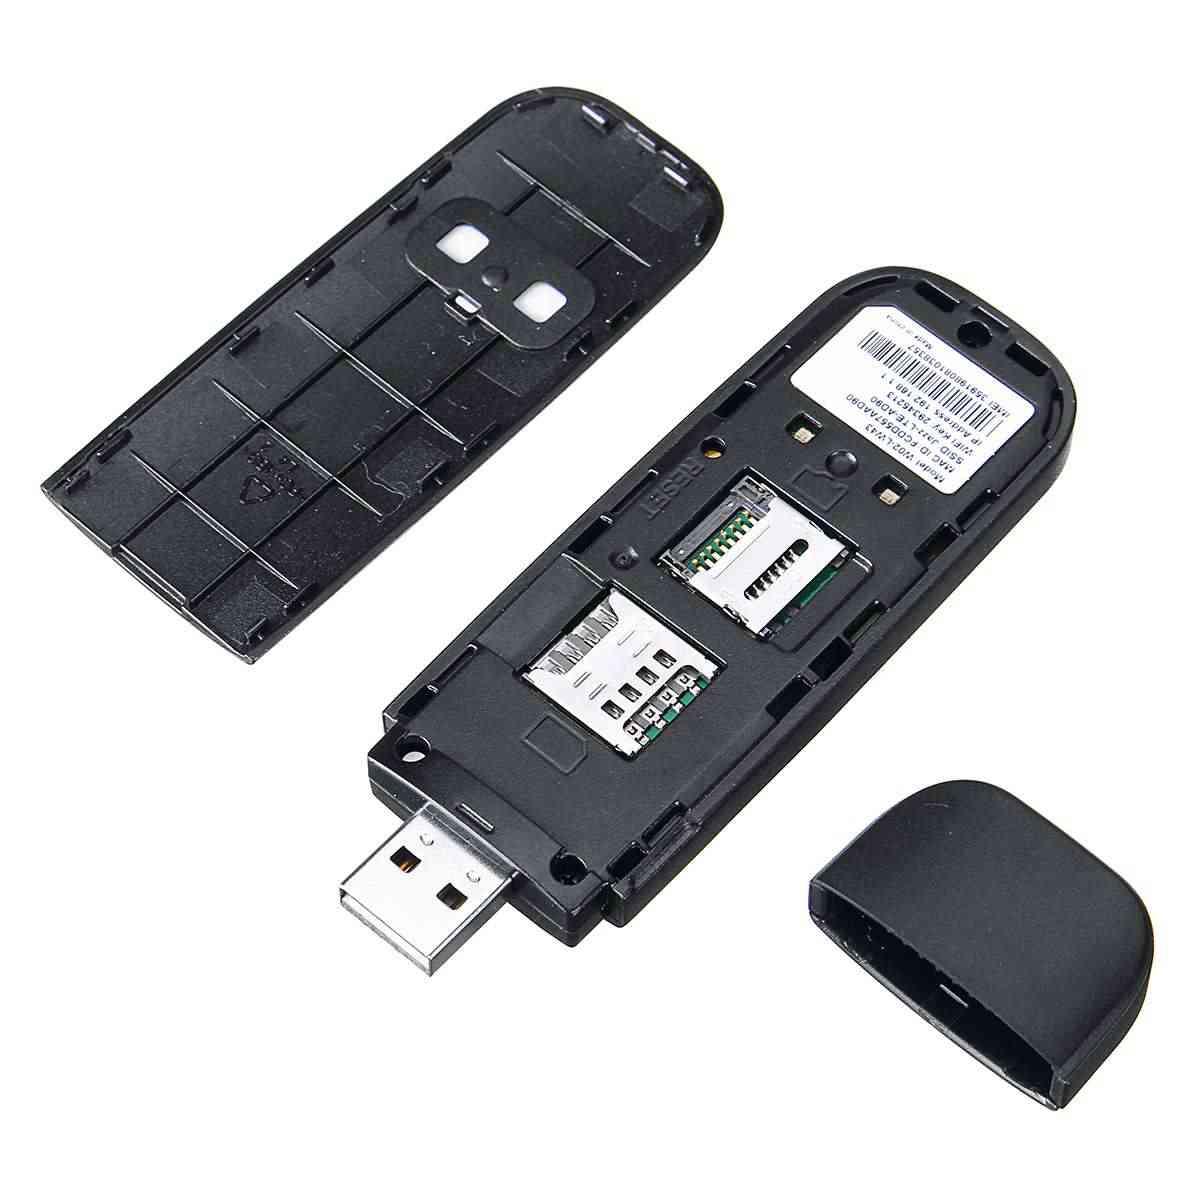 LEORY 4G LTE USB 150Mbps مودم محول الشبكة مع واي فاي هوت سبوت سيم بطاقة 4G راوتر لاسلكي للسفر سيارة في الهواء الطلق مكتب